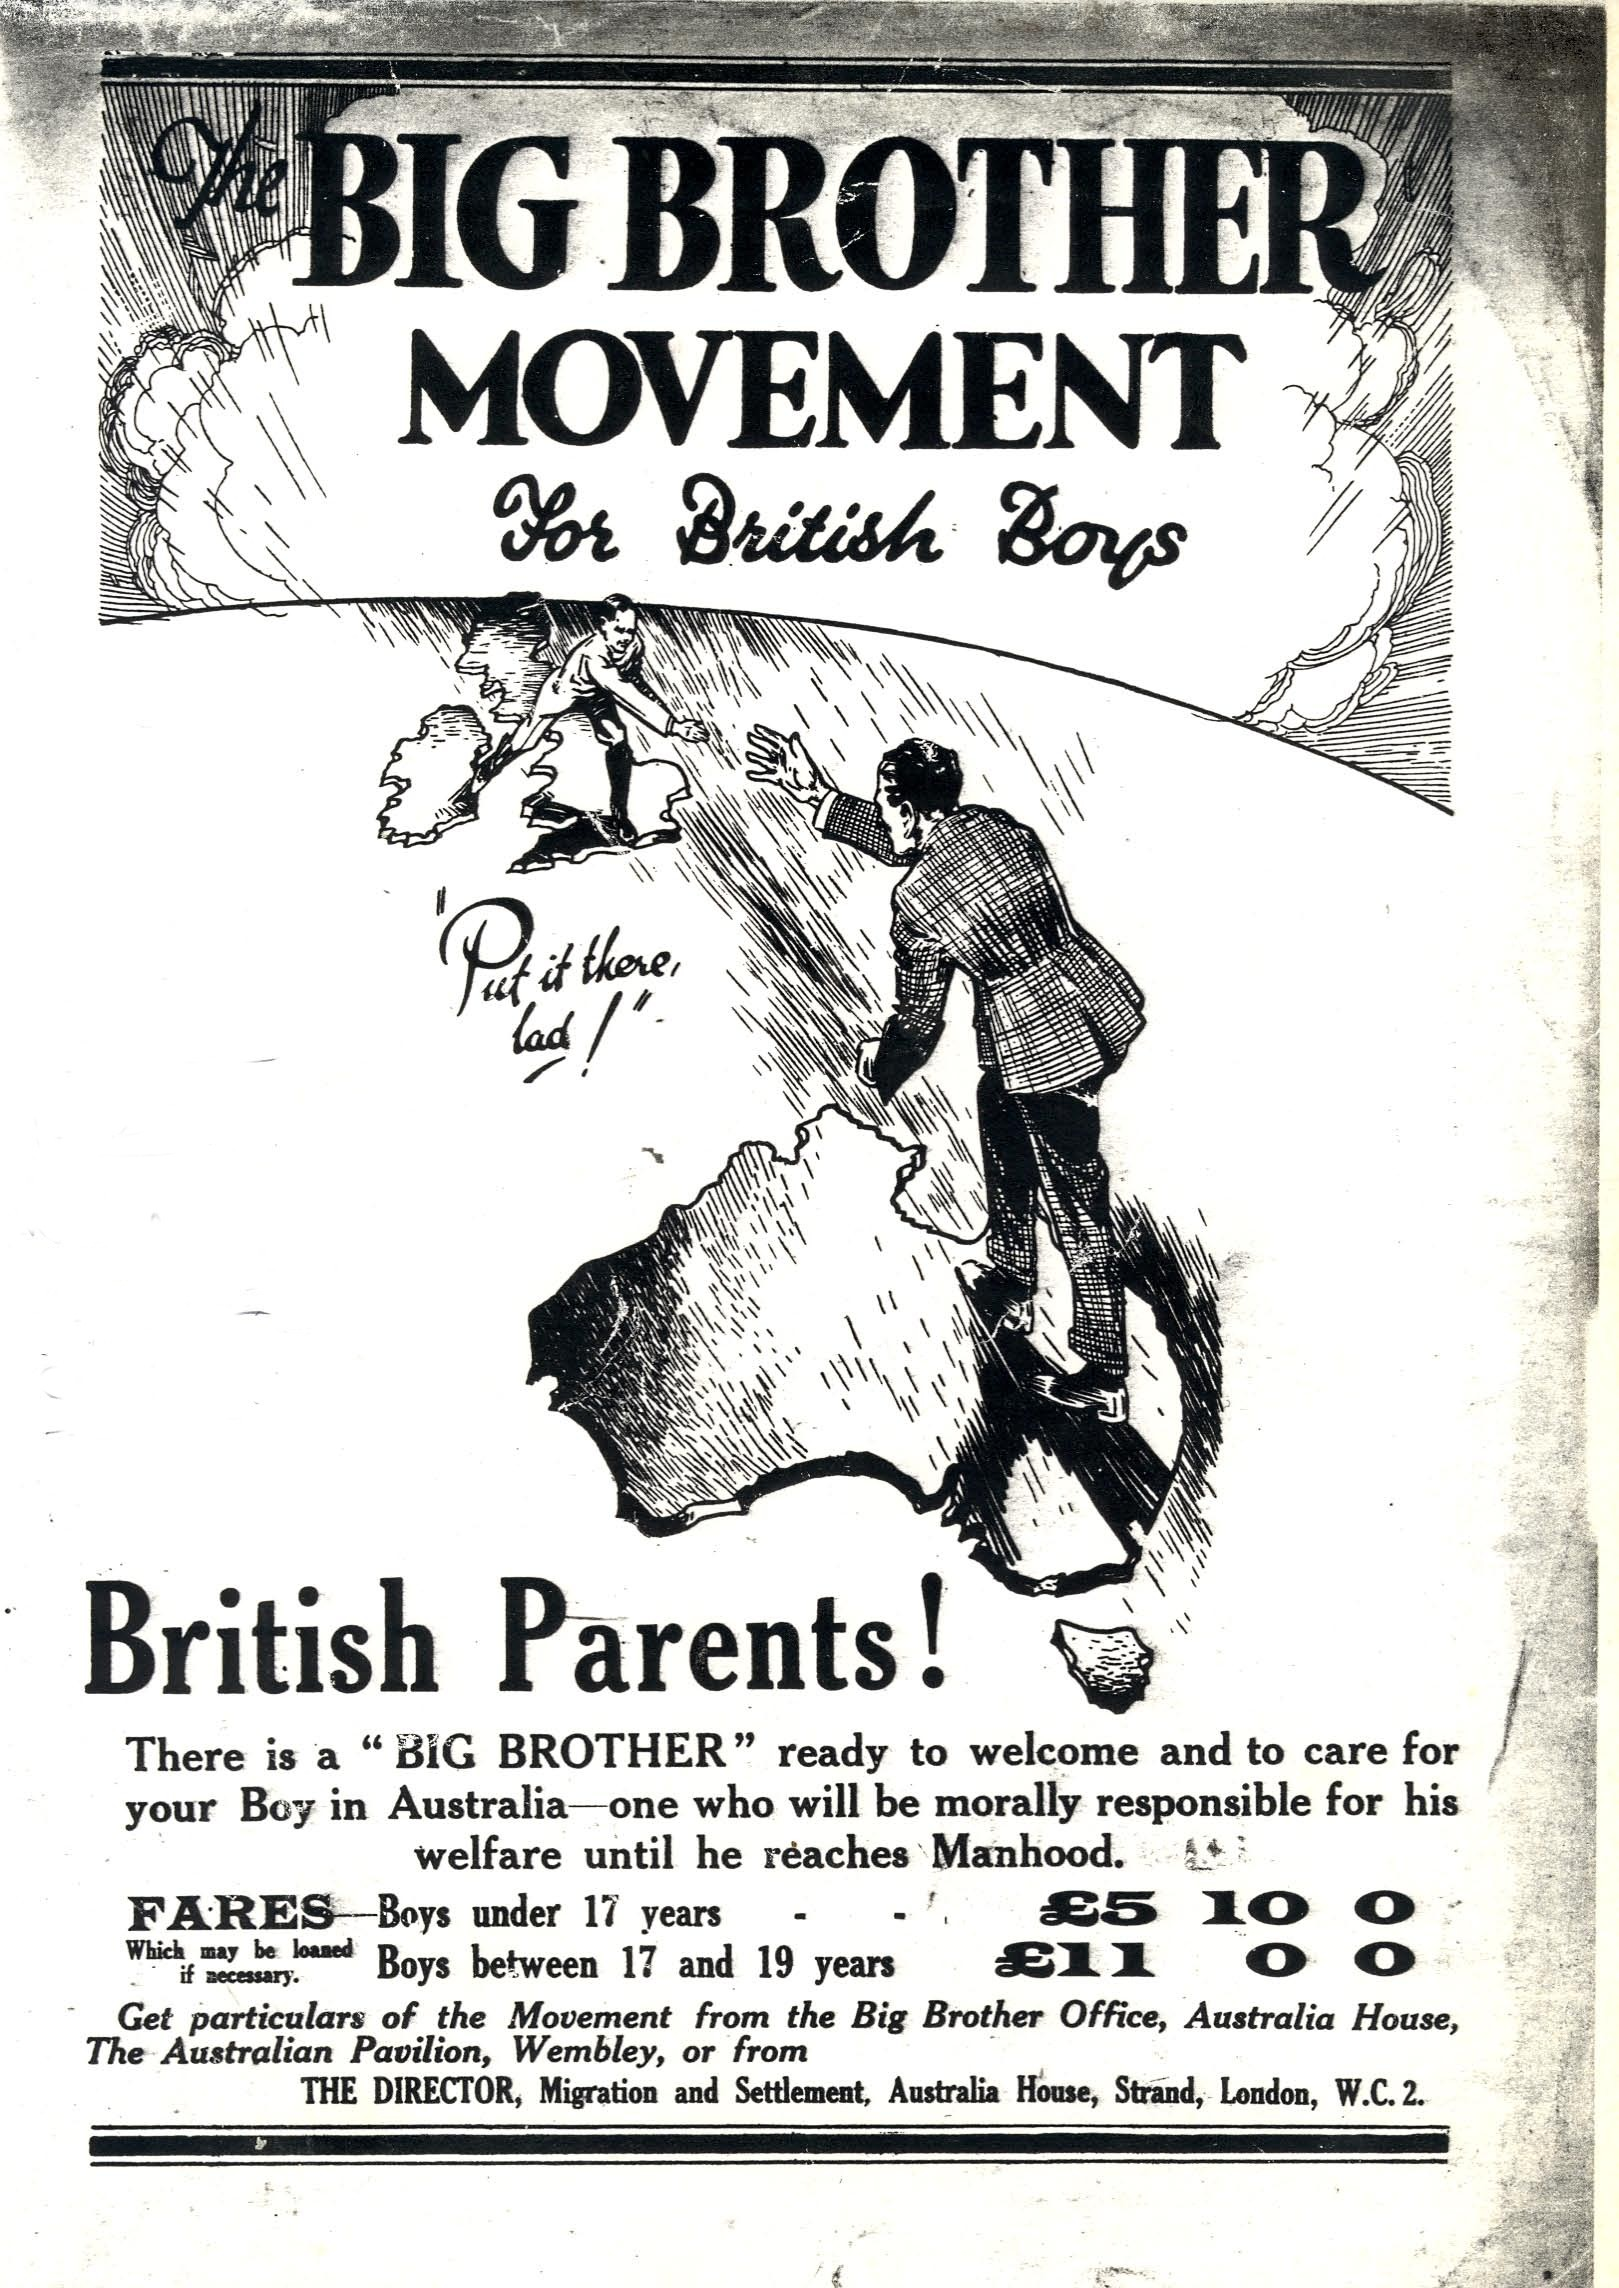 1924 Wembley Exhibition Catalogue.jpg